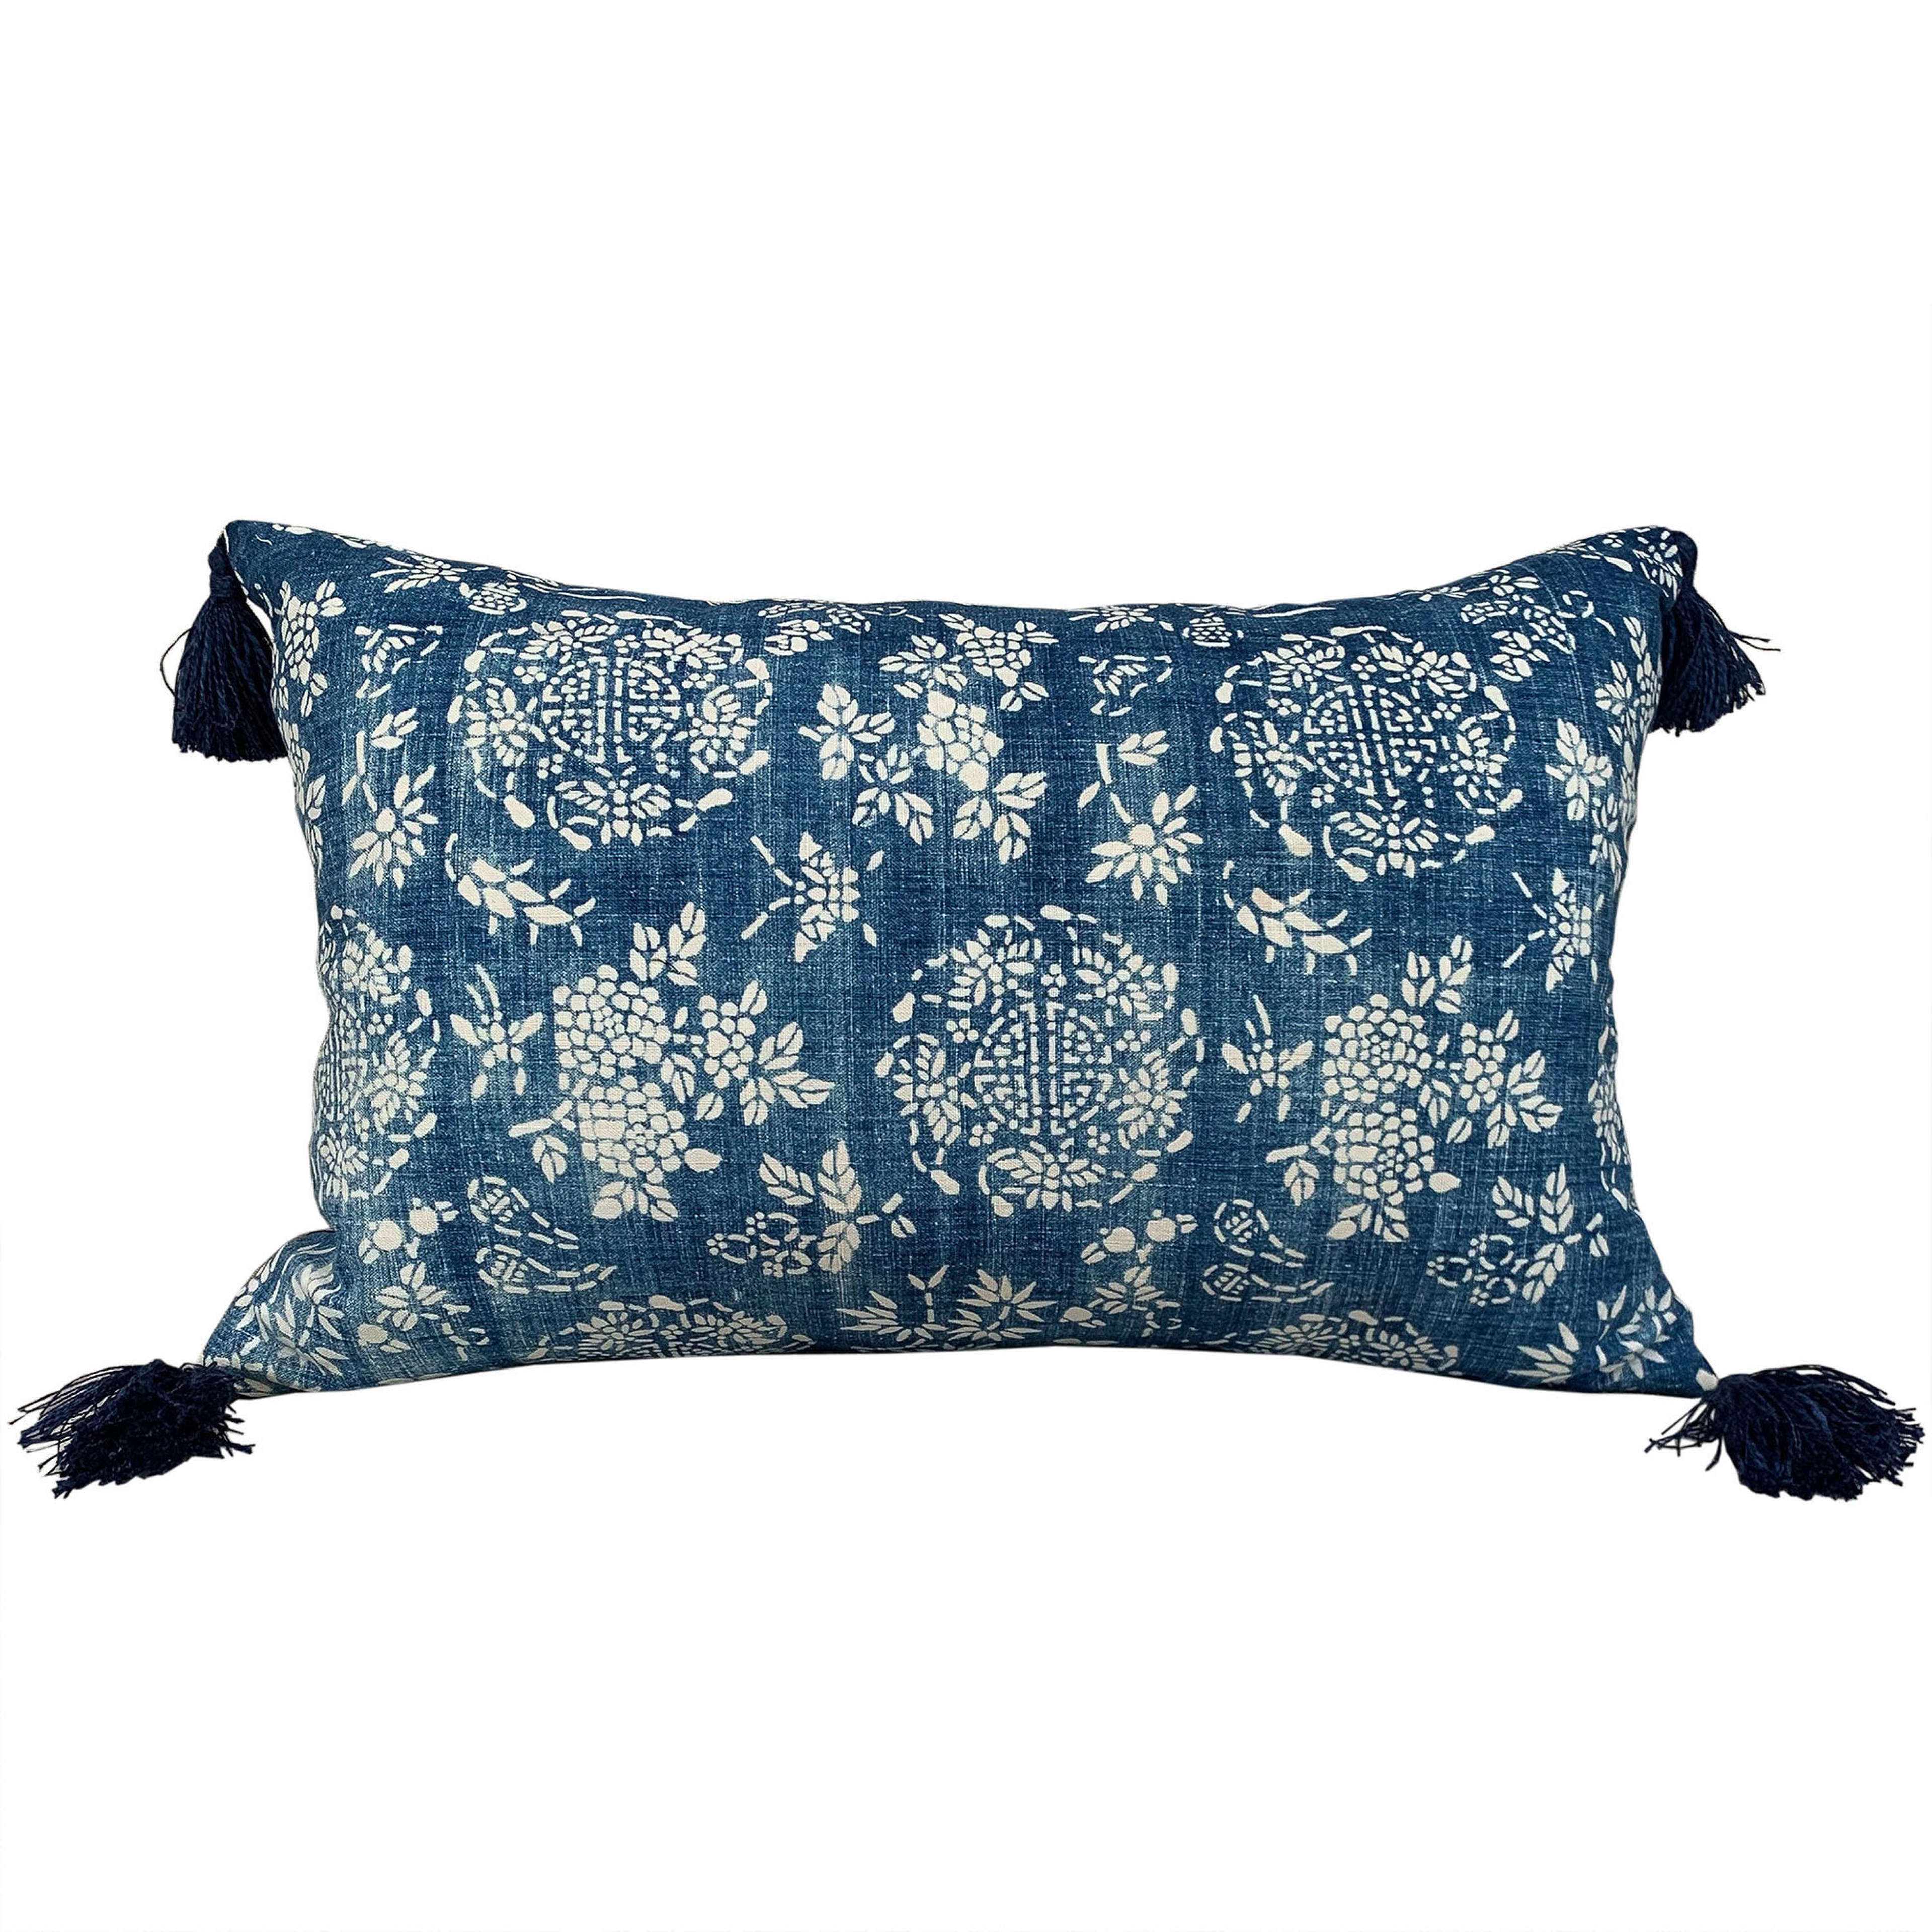 Indigo resist cushions with tassels